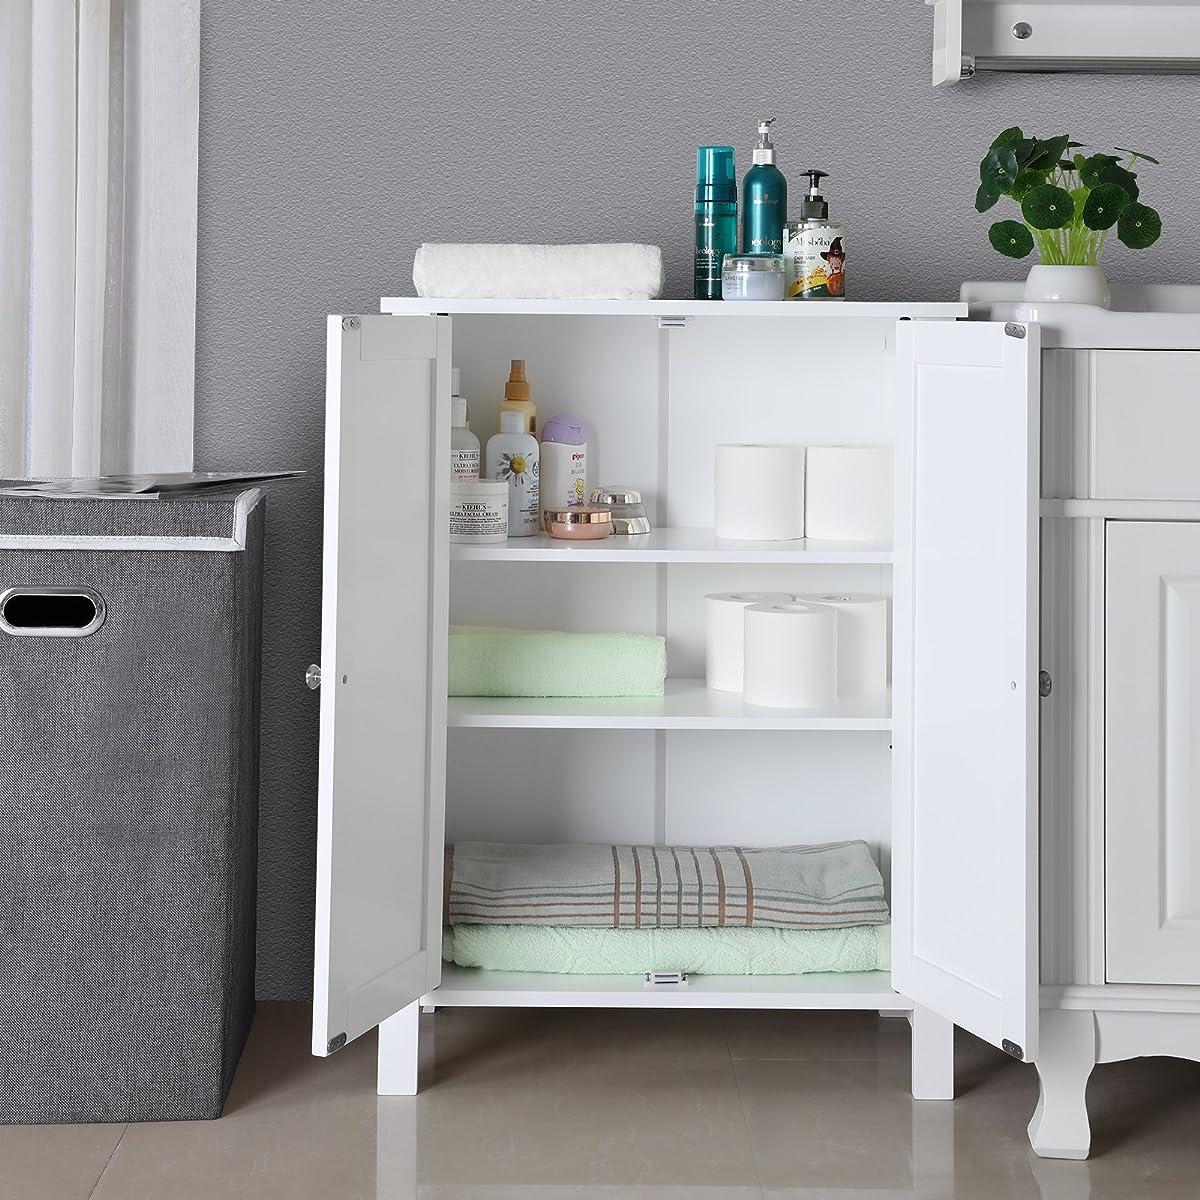 SONGMICS Bathroom Floor Storage Cabinet with Double Door Adjustable Shelf White UBCB60W